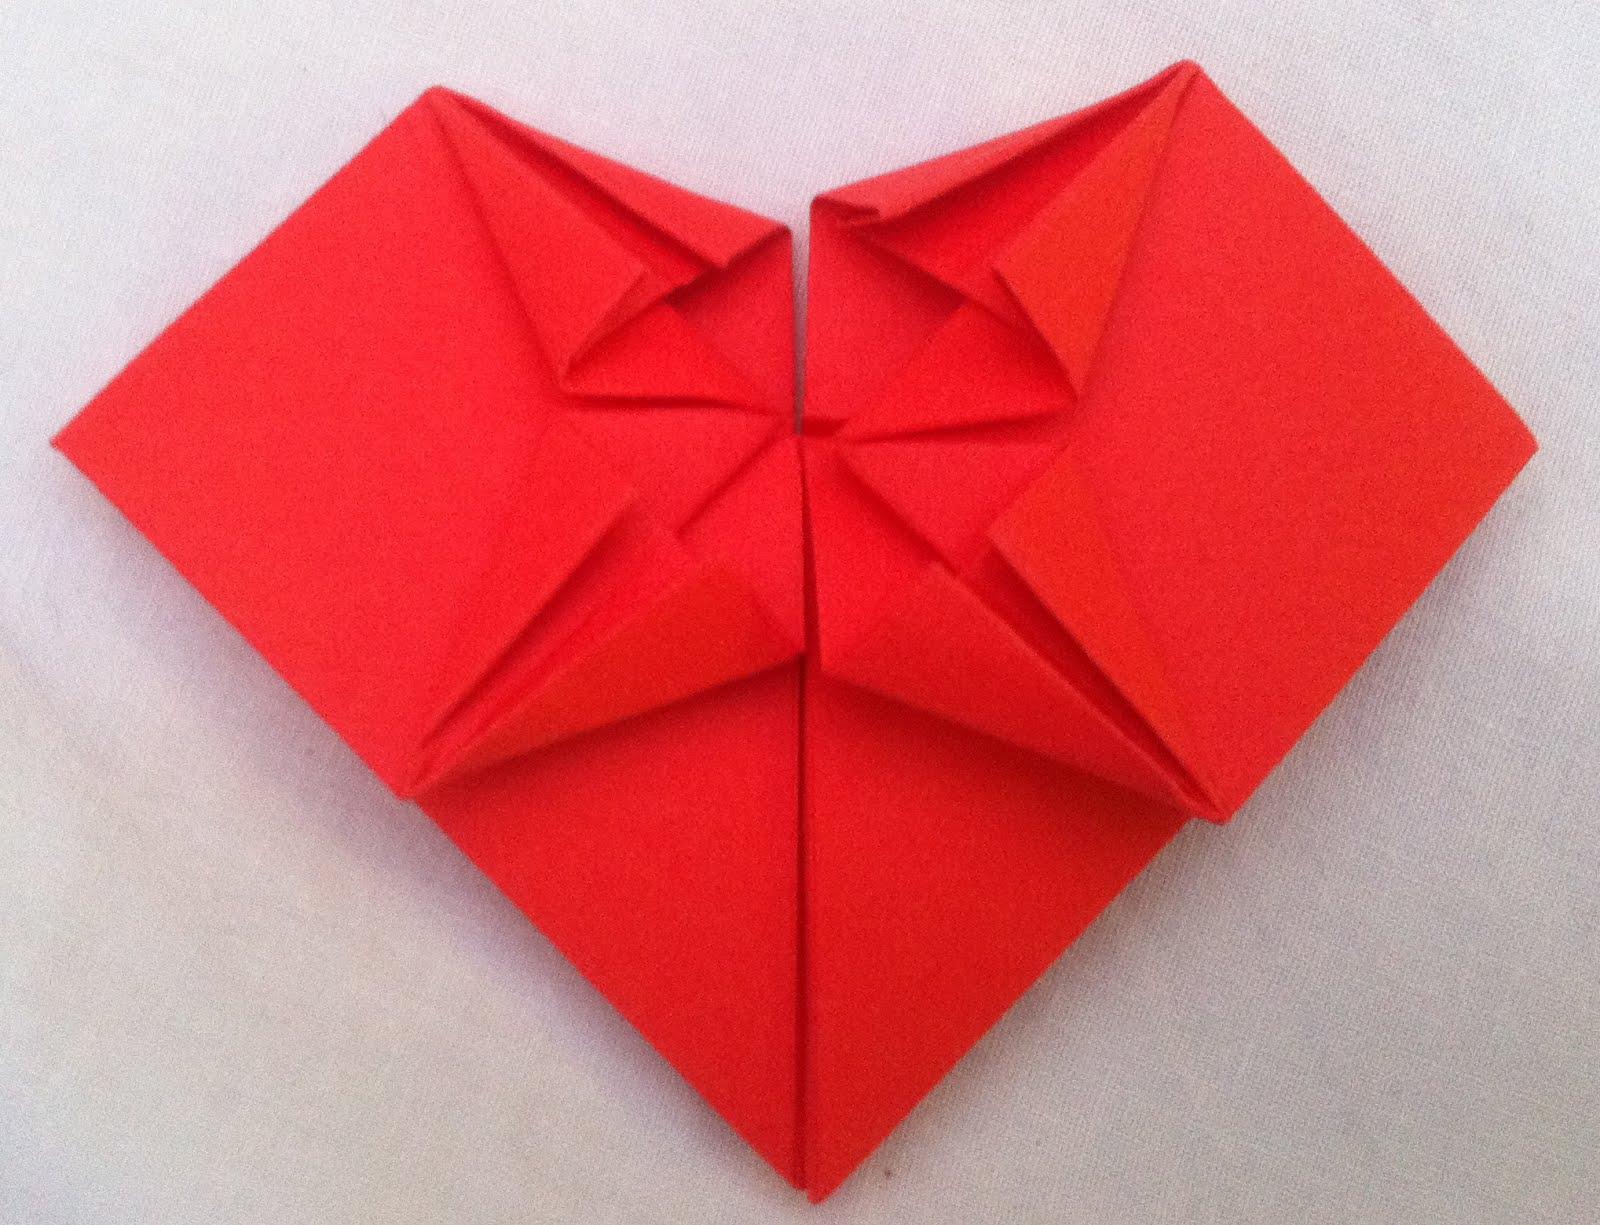 origami hearts - 28 images - origami garland hiragana, how ... - photo#10